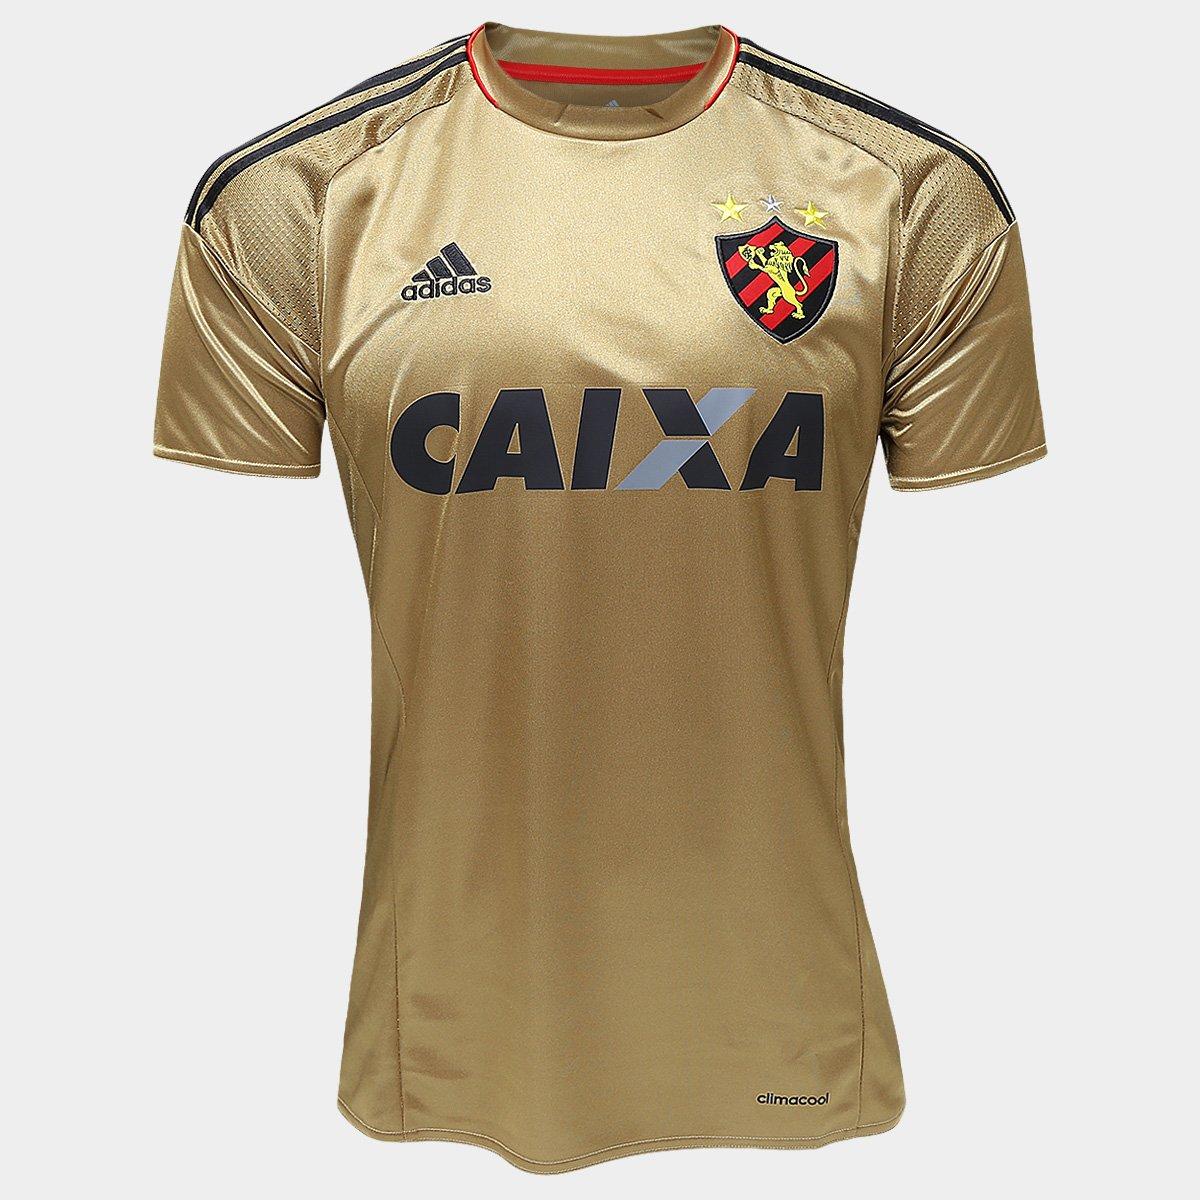 92260834ea30b Camisa Sport Recife 2016 III s nº Torcedor Adidas Masculina - Compre Agora